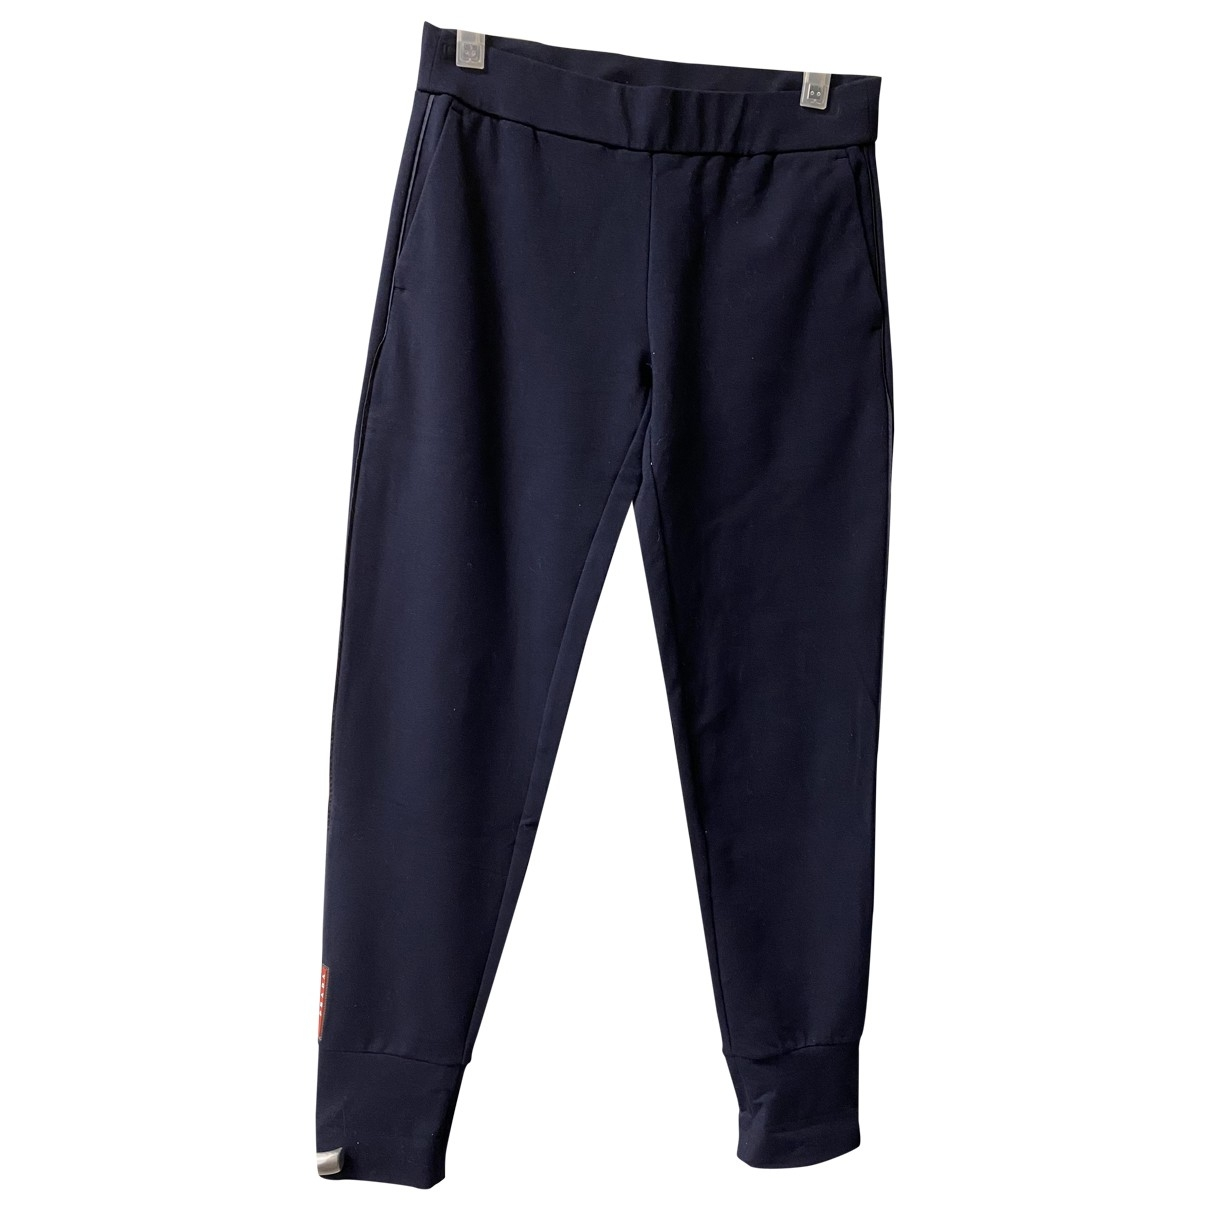 Prada \N Blue Cotton Trousers for Women M International